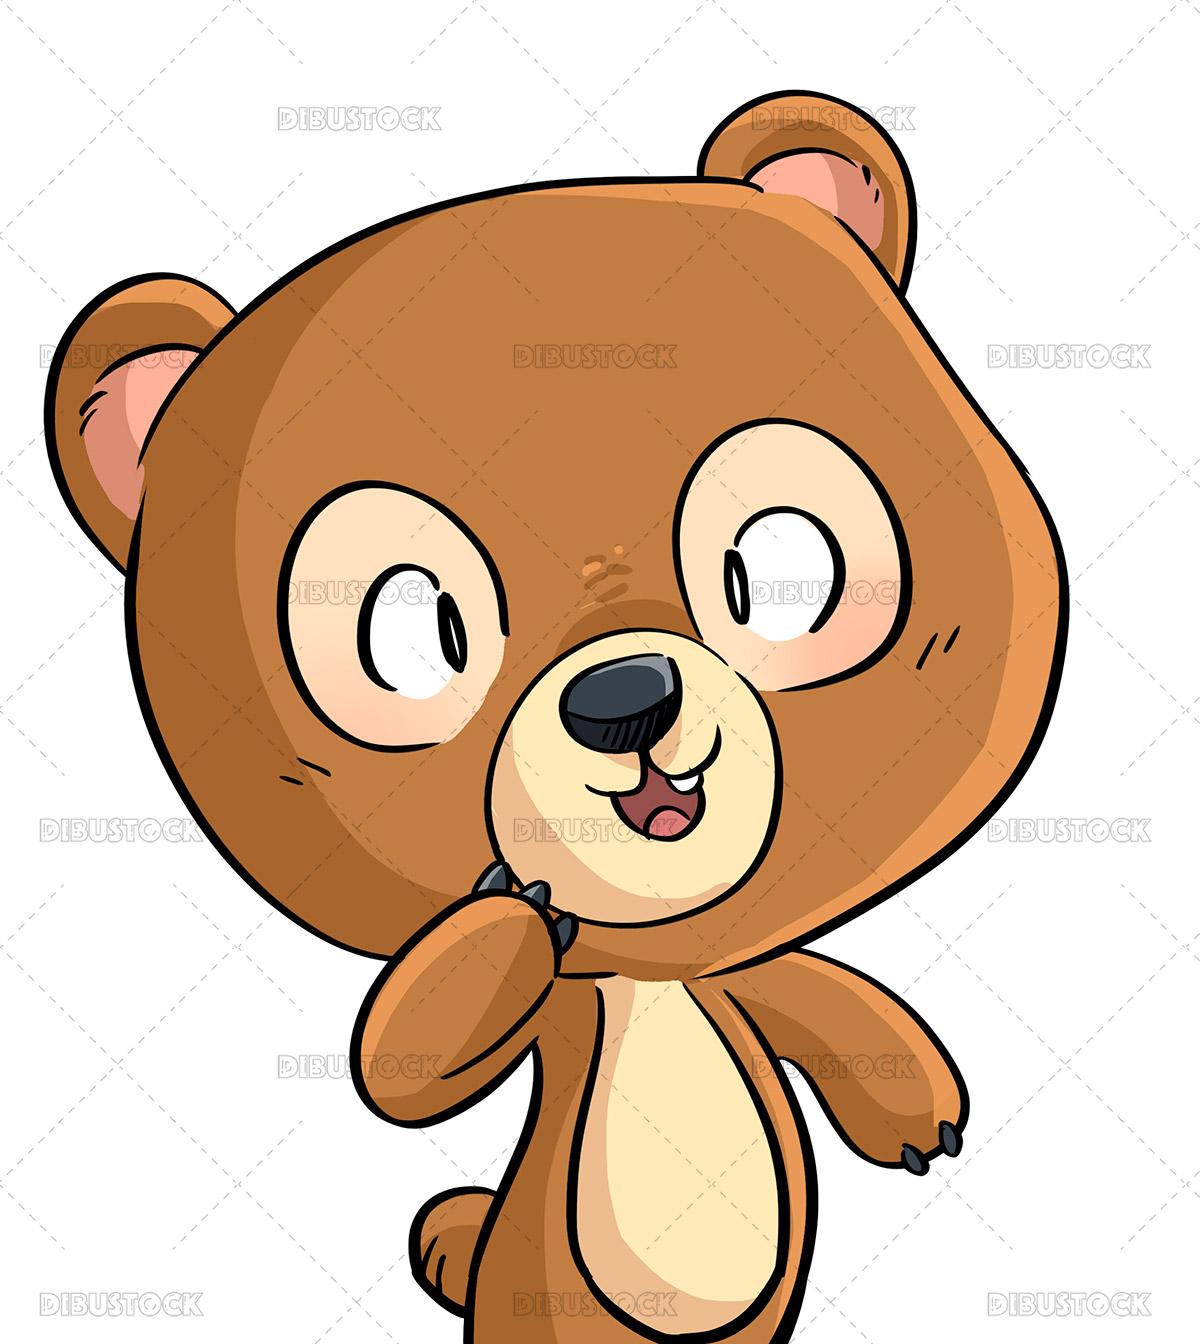 Illustration of happy kid wearing a bear costume